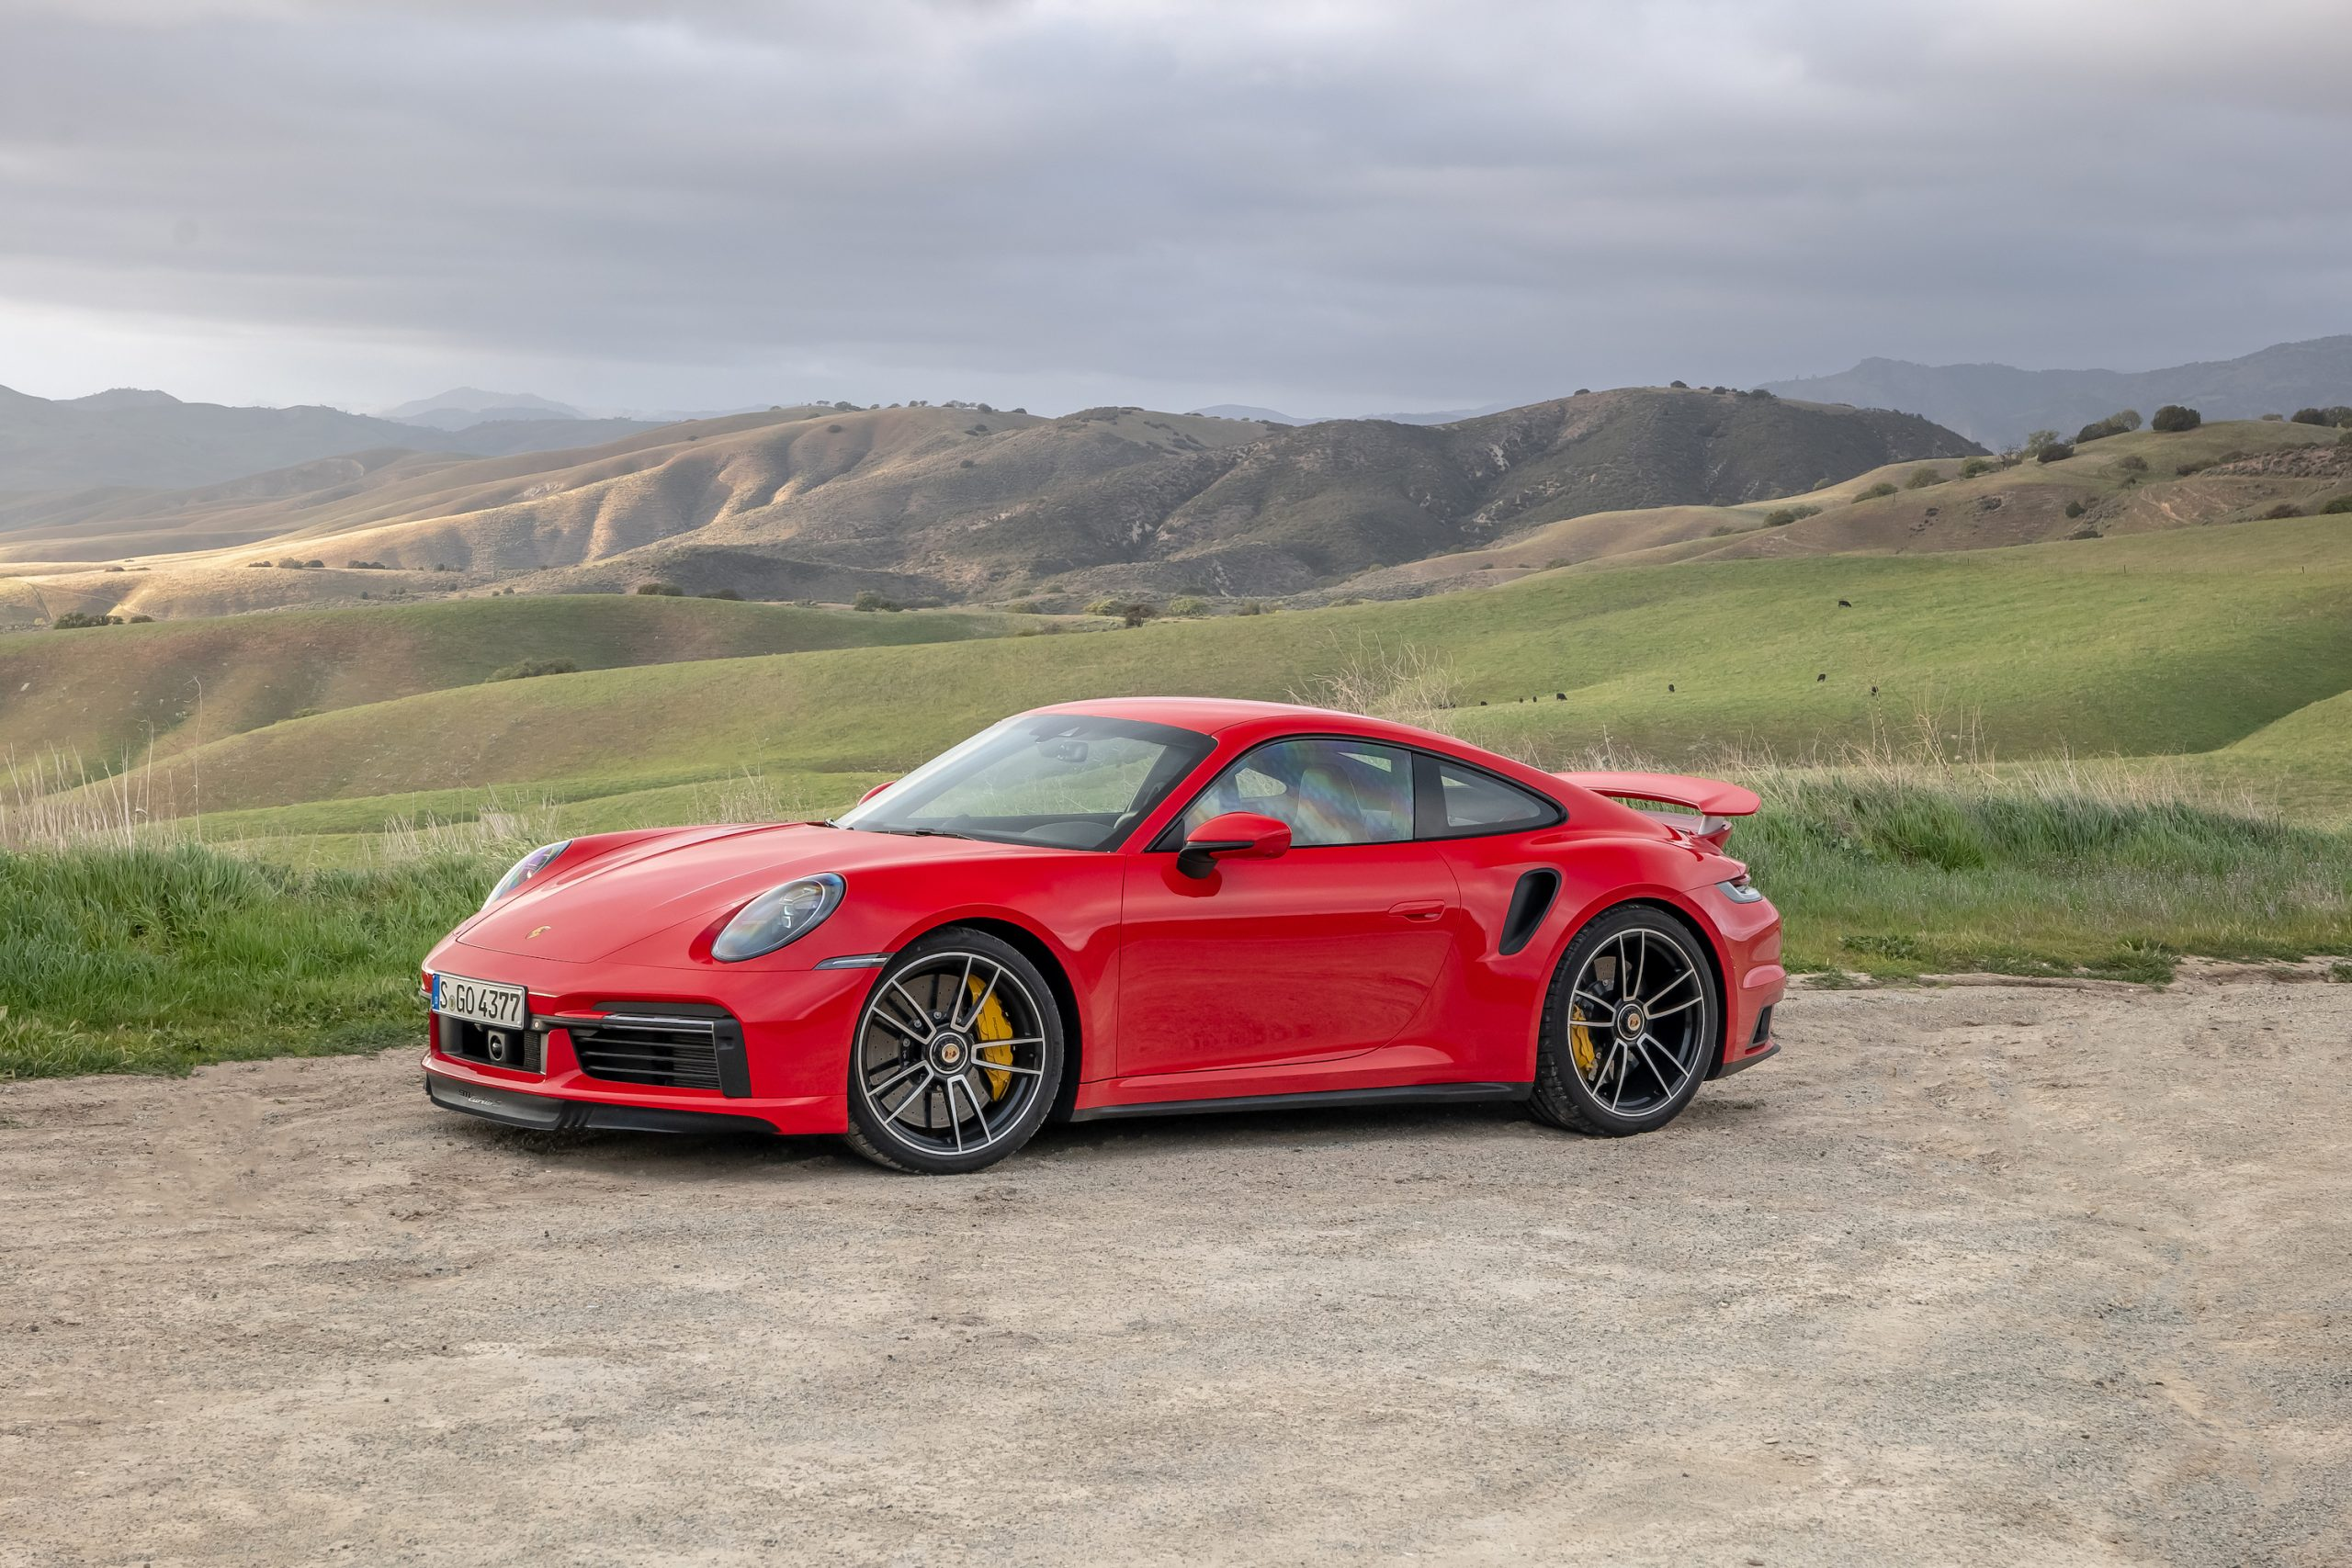 2021 Porsche 911 Turbo S Front Three-Quarter